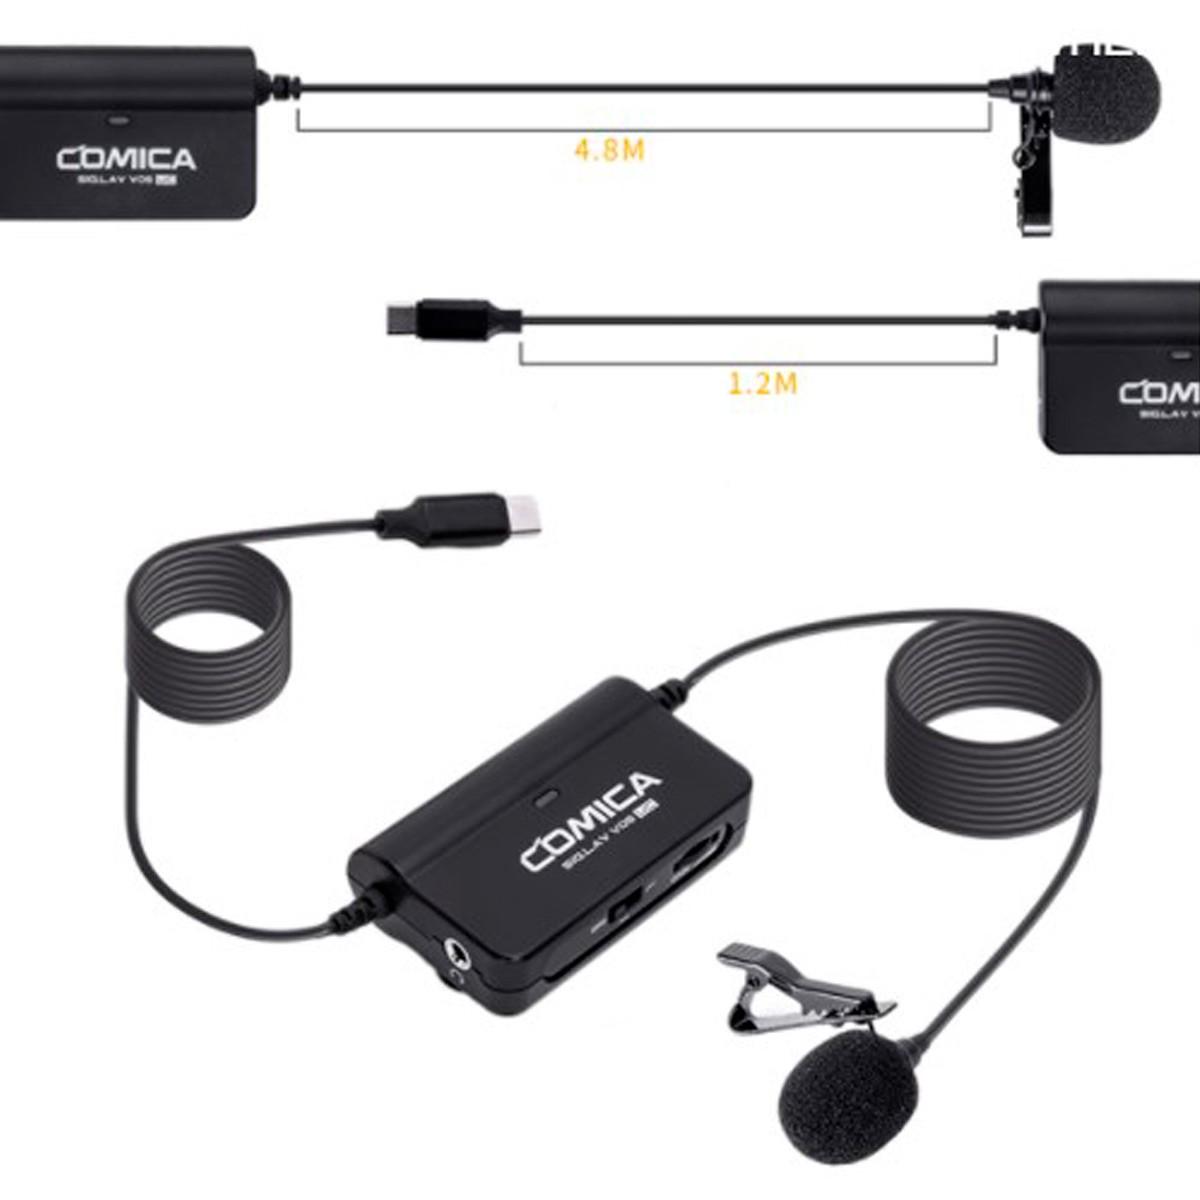 Microfone Lapela Comica Profissional Sig.Lav V05 UC Smartphone USB-C